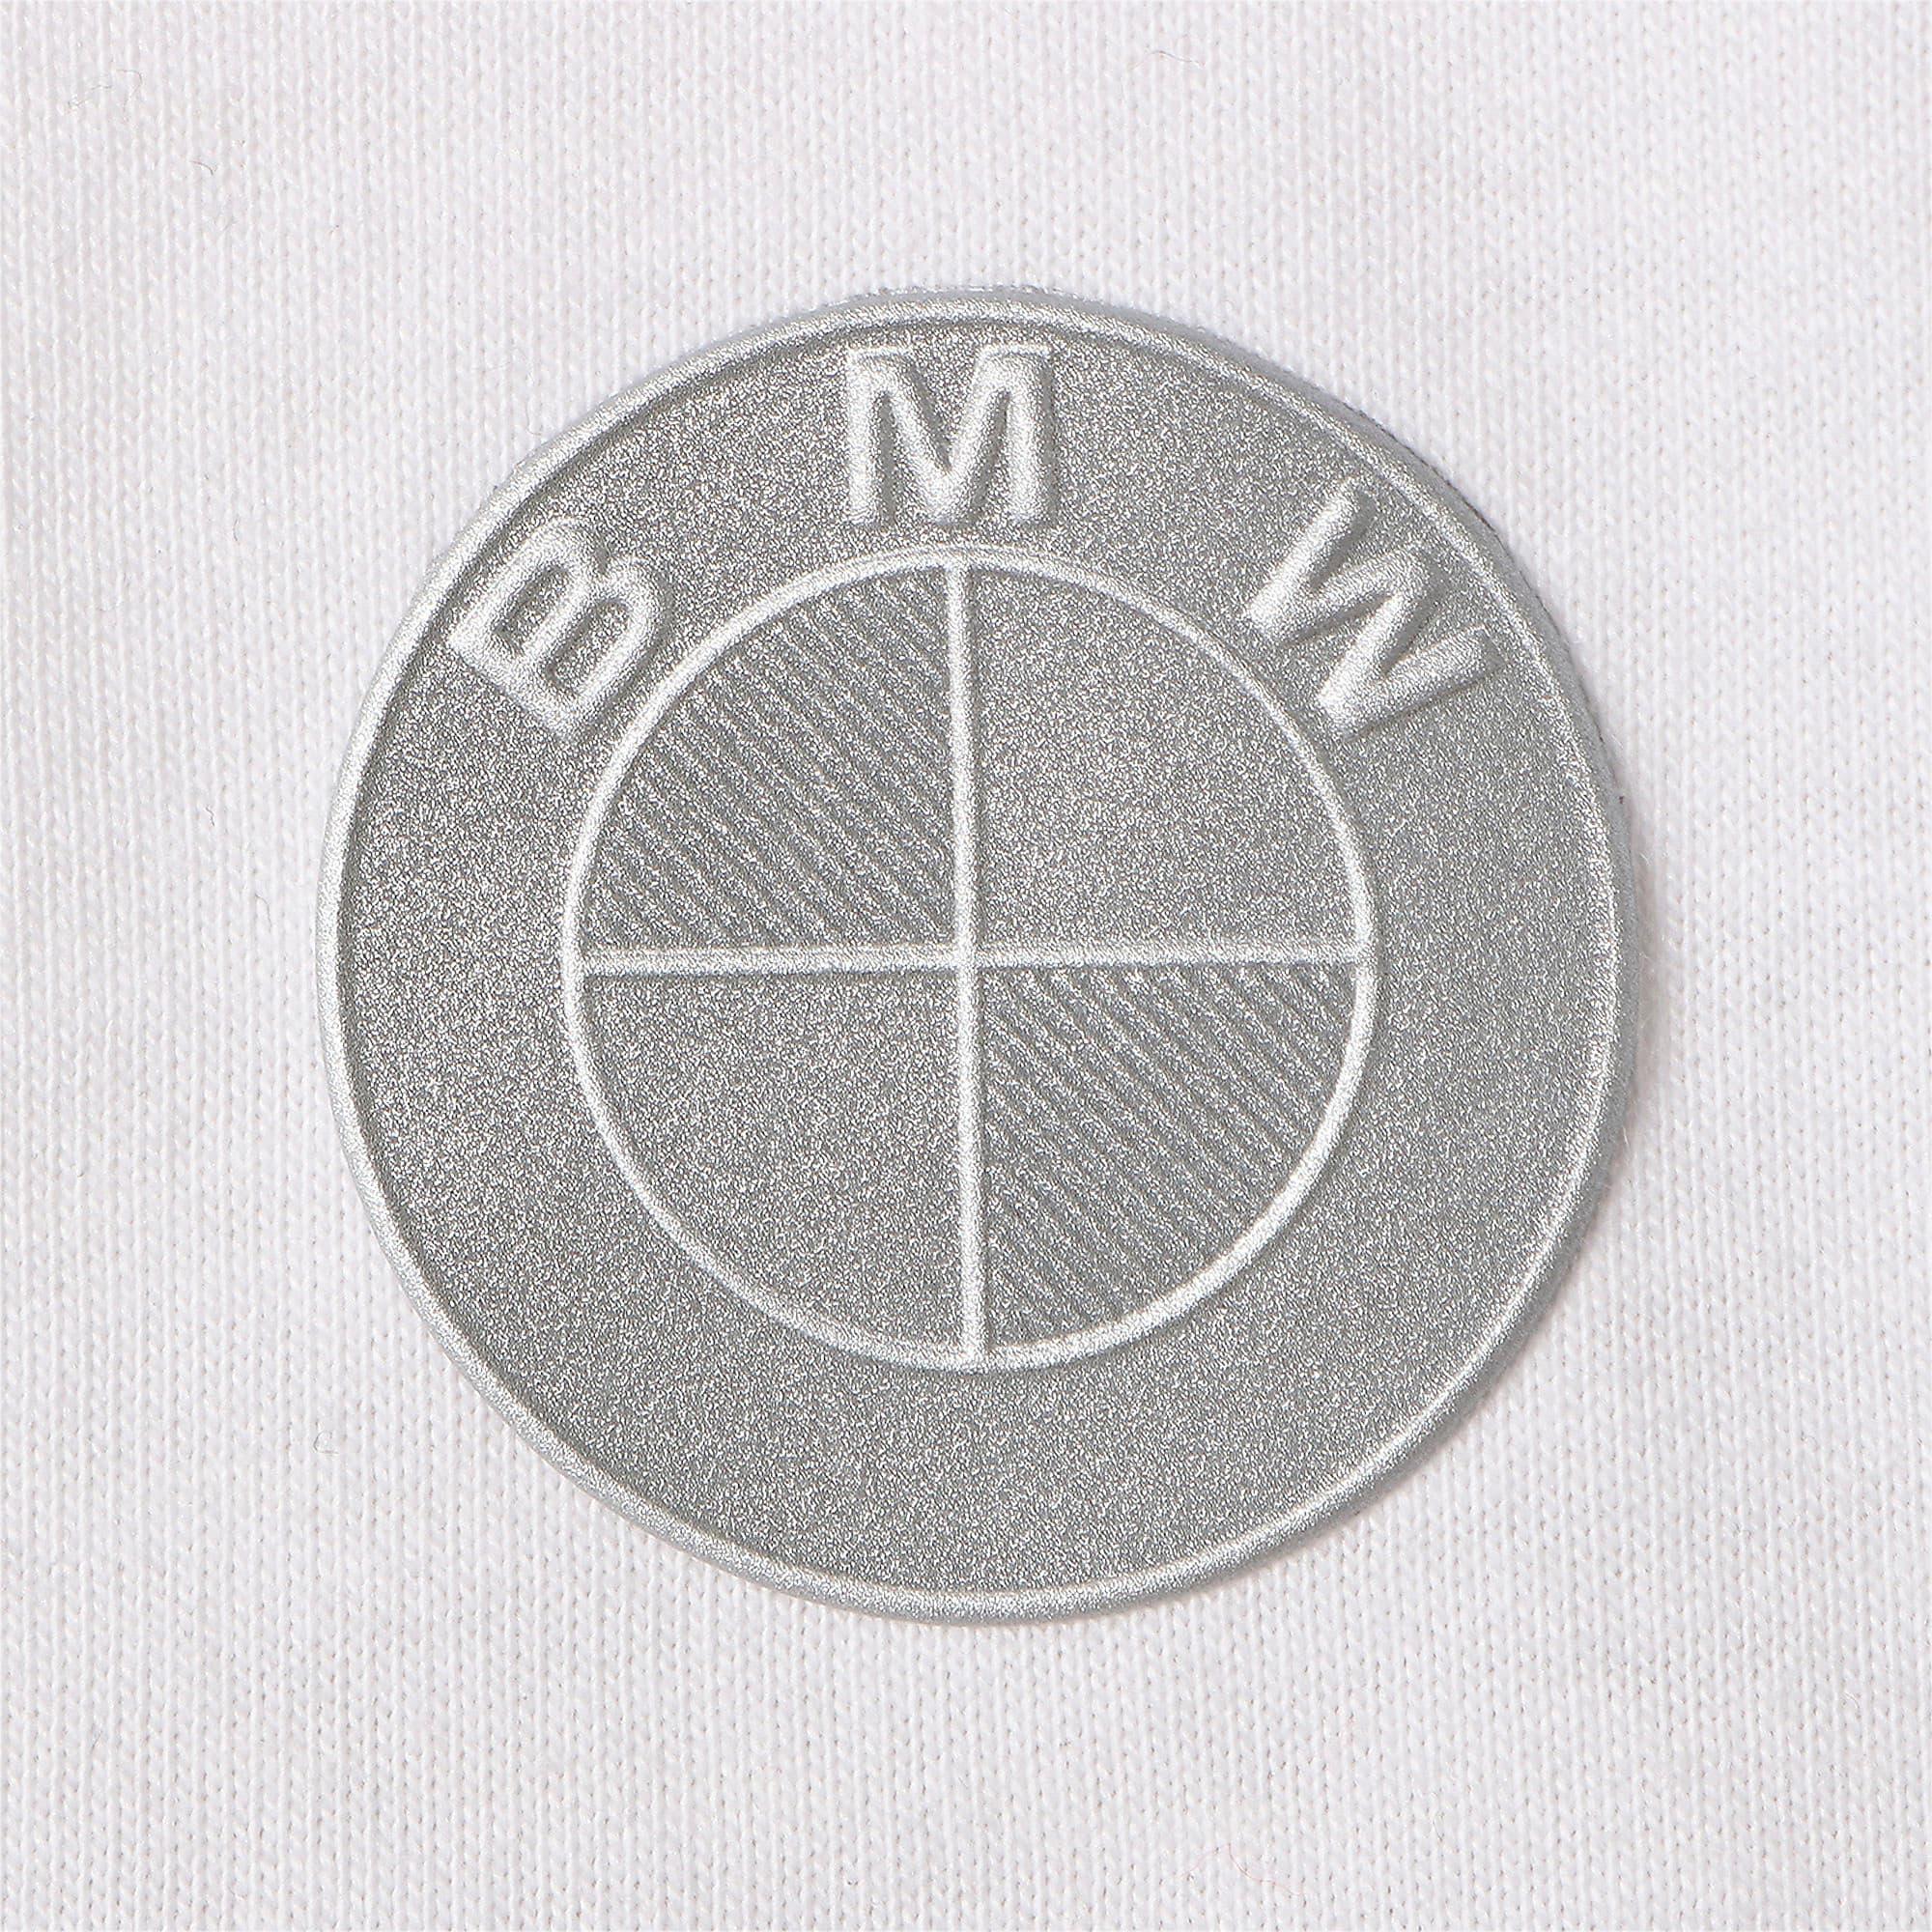 Thumbnail 8 of BMW MMS ライフ Tシャツ, Puma White, medium-JPN